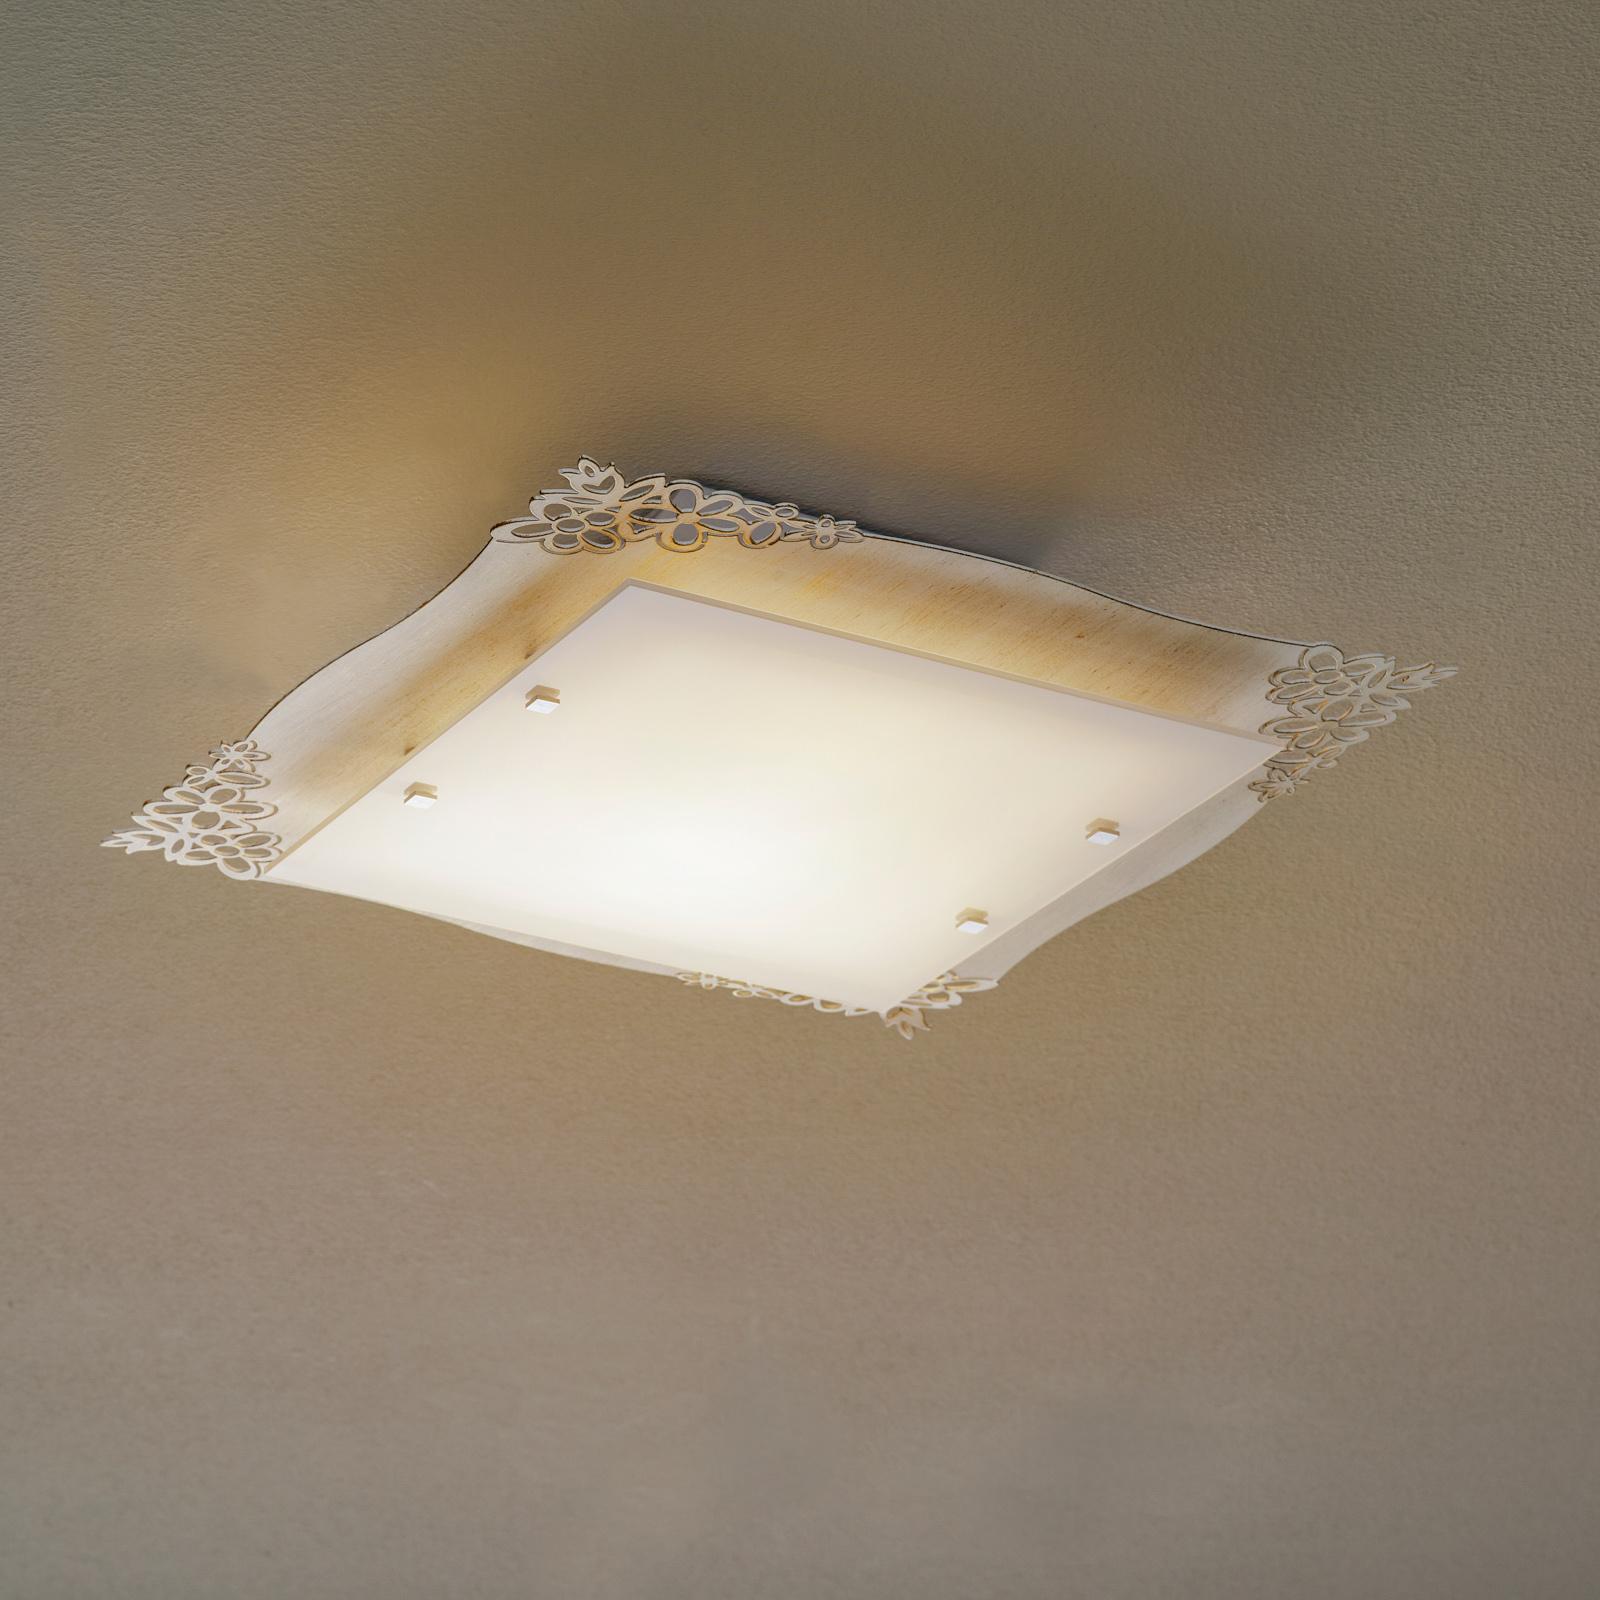 2065/PL41 taklampe, kvadratisk, savana hvit